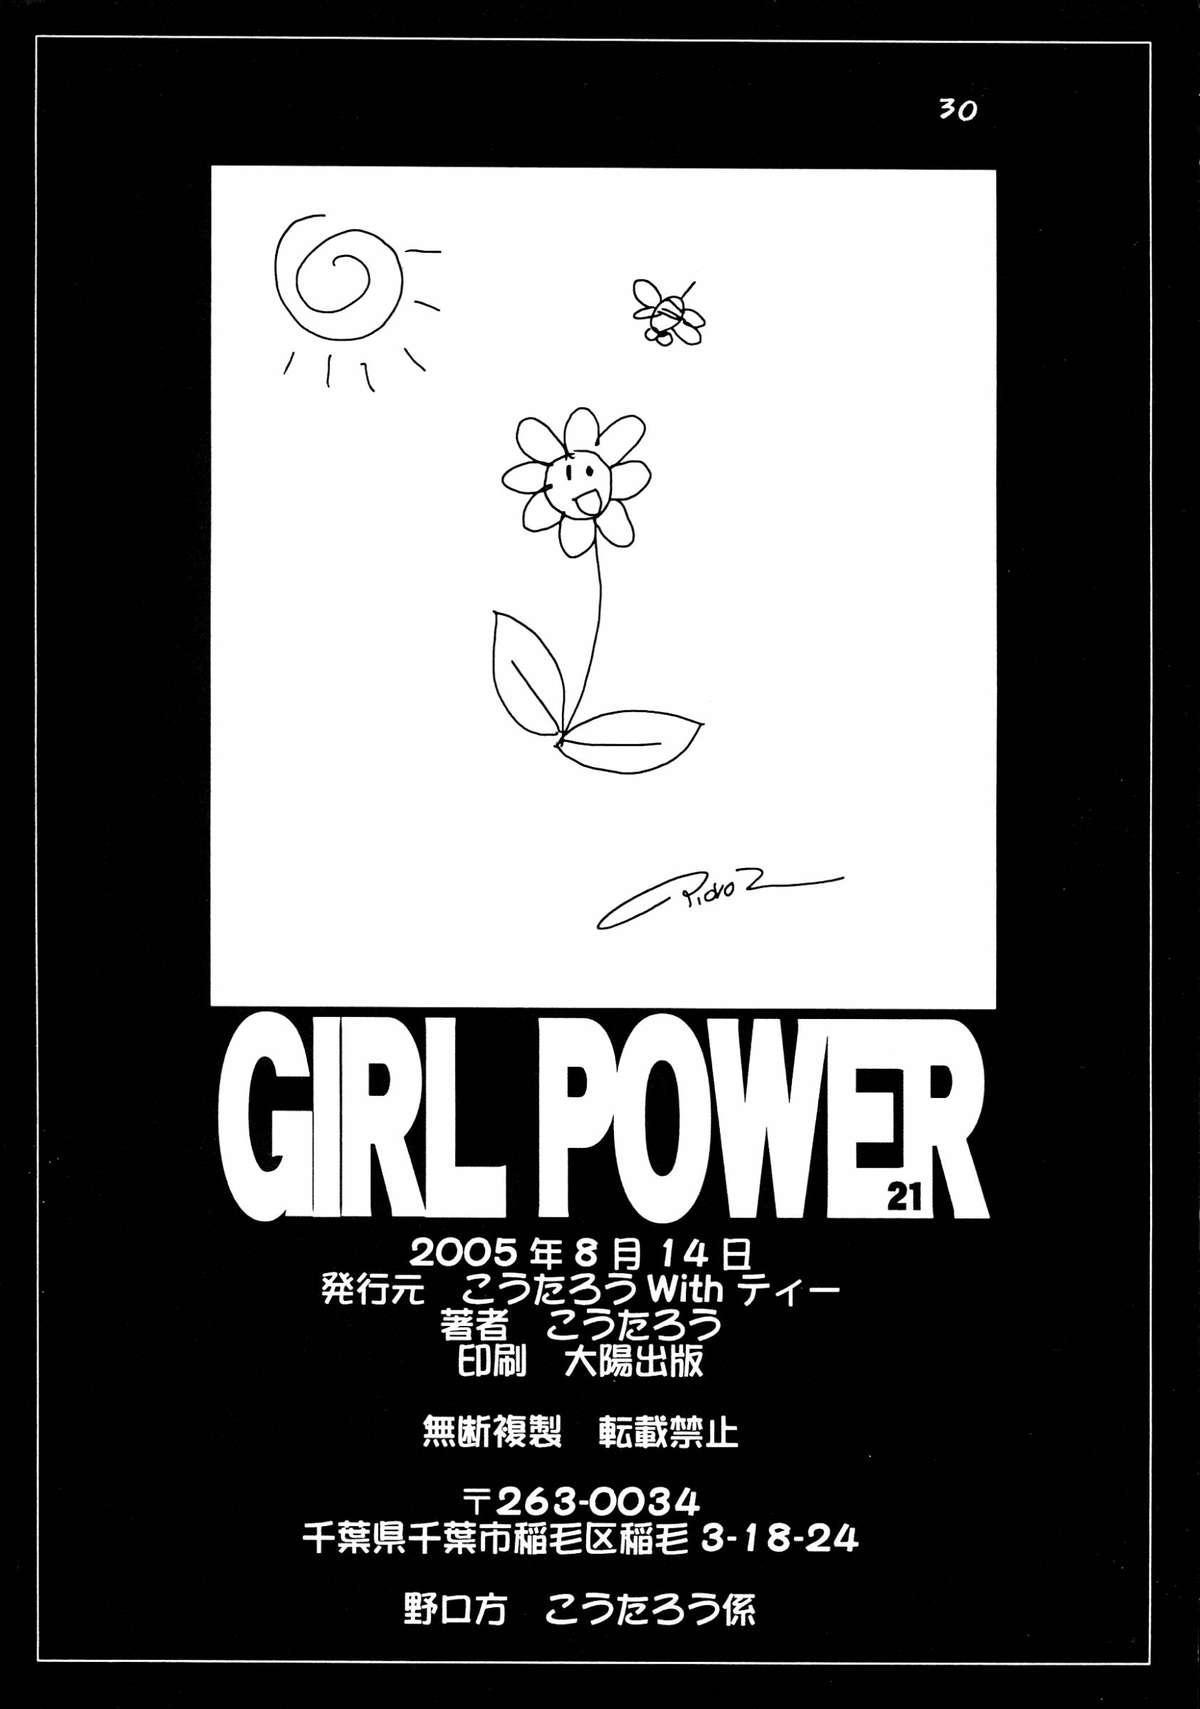 GIRL POWER vol.21 29